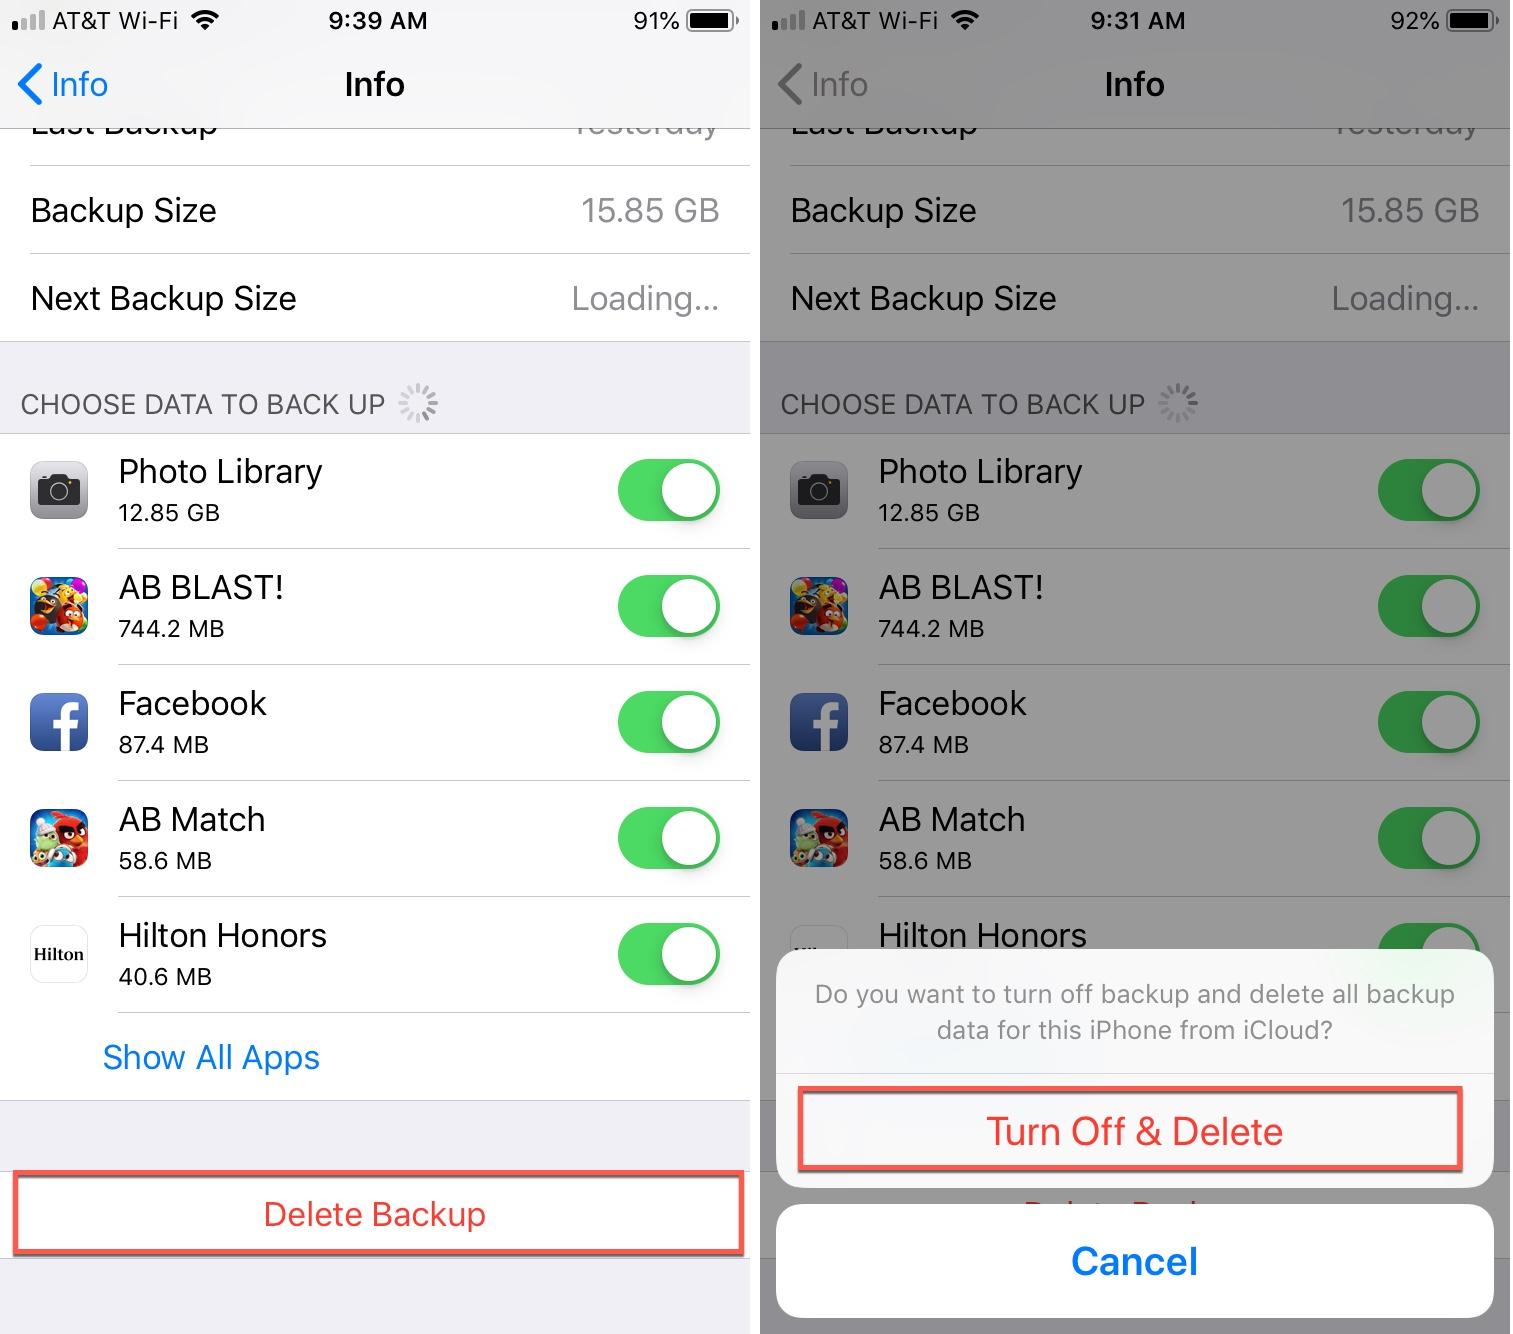 iCloud Delete Backup Turn Off iPhone